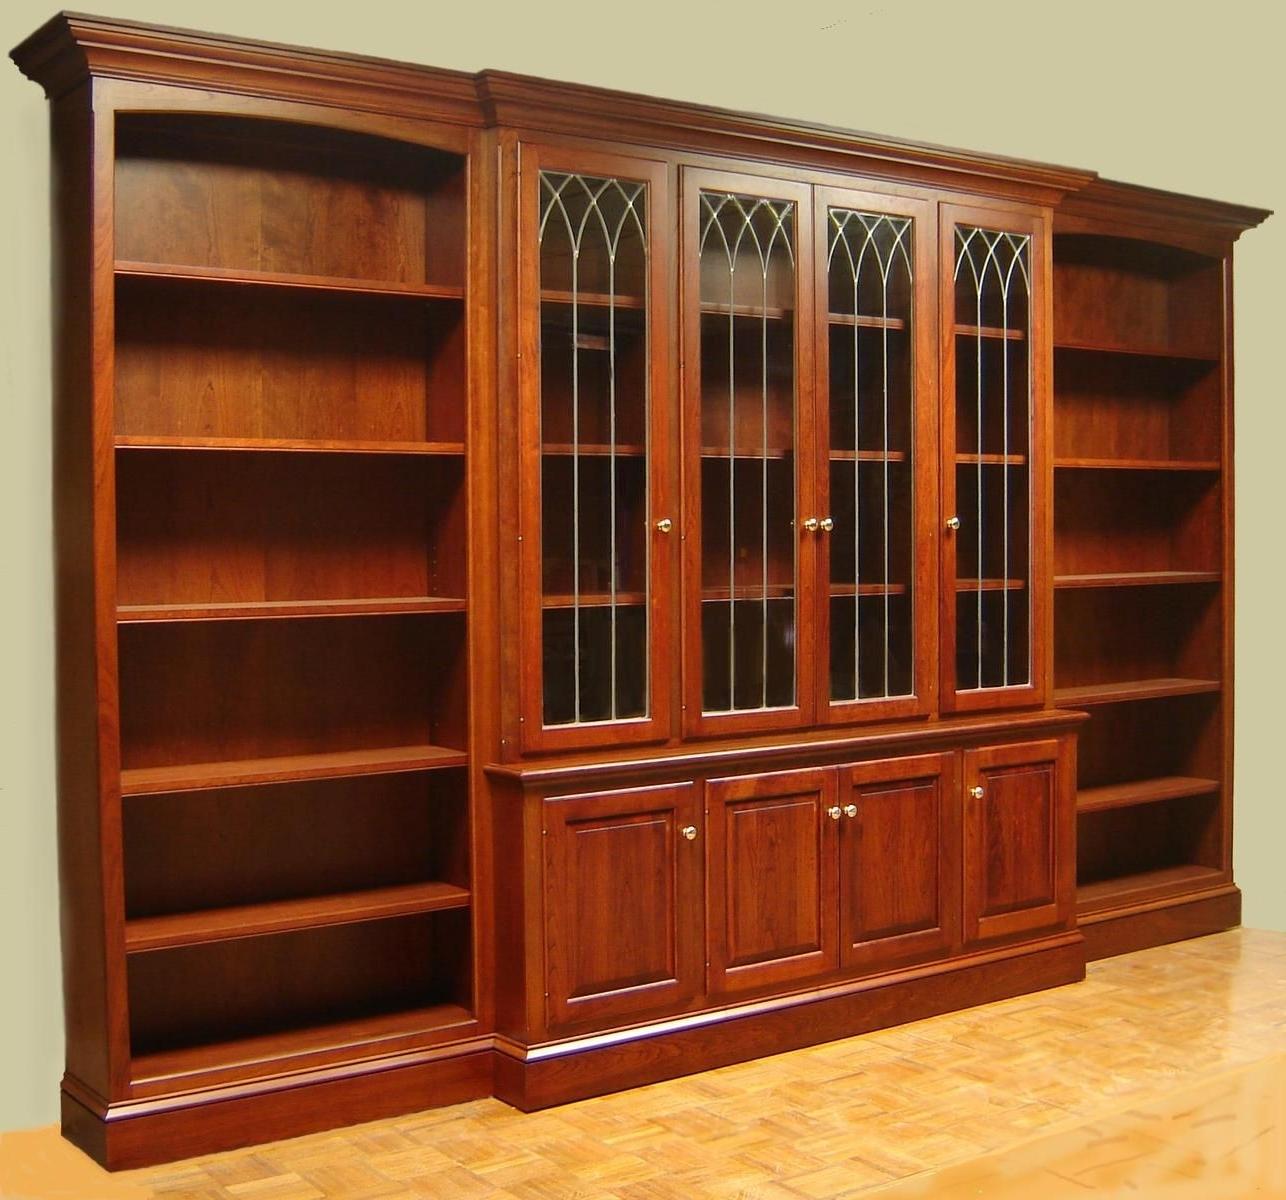 Most Recent Classic Bookshelves Design Pertaining To Glass Doors : Classic Bookshelves With Glass Doors – Ana White (View 14 of 15)